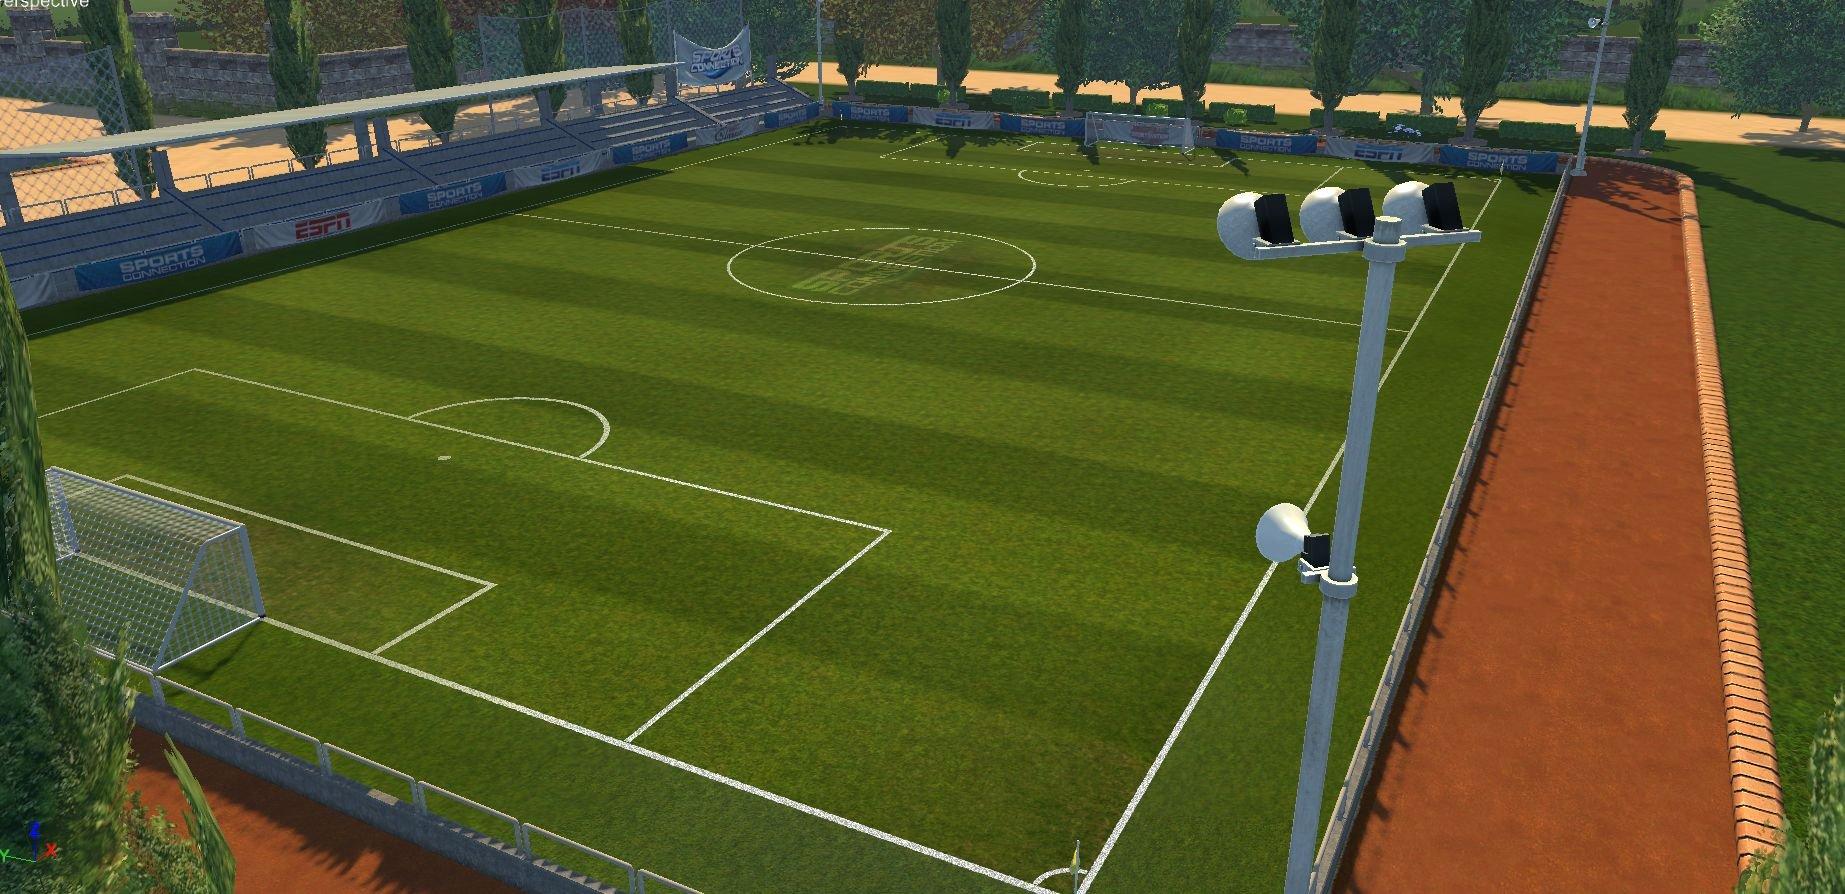 Pere balsach sc soccer 01 03